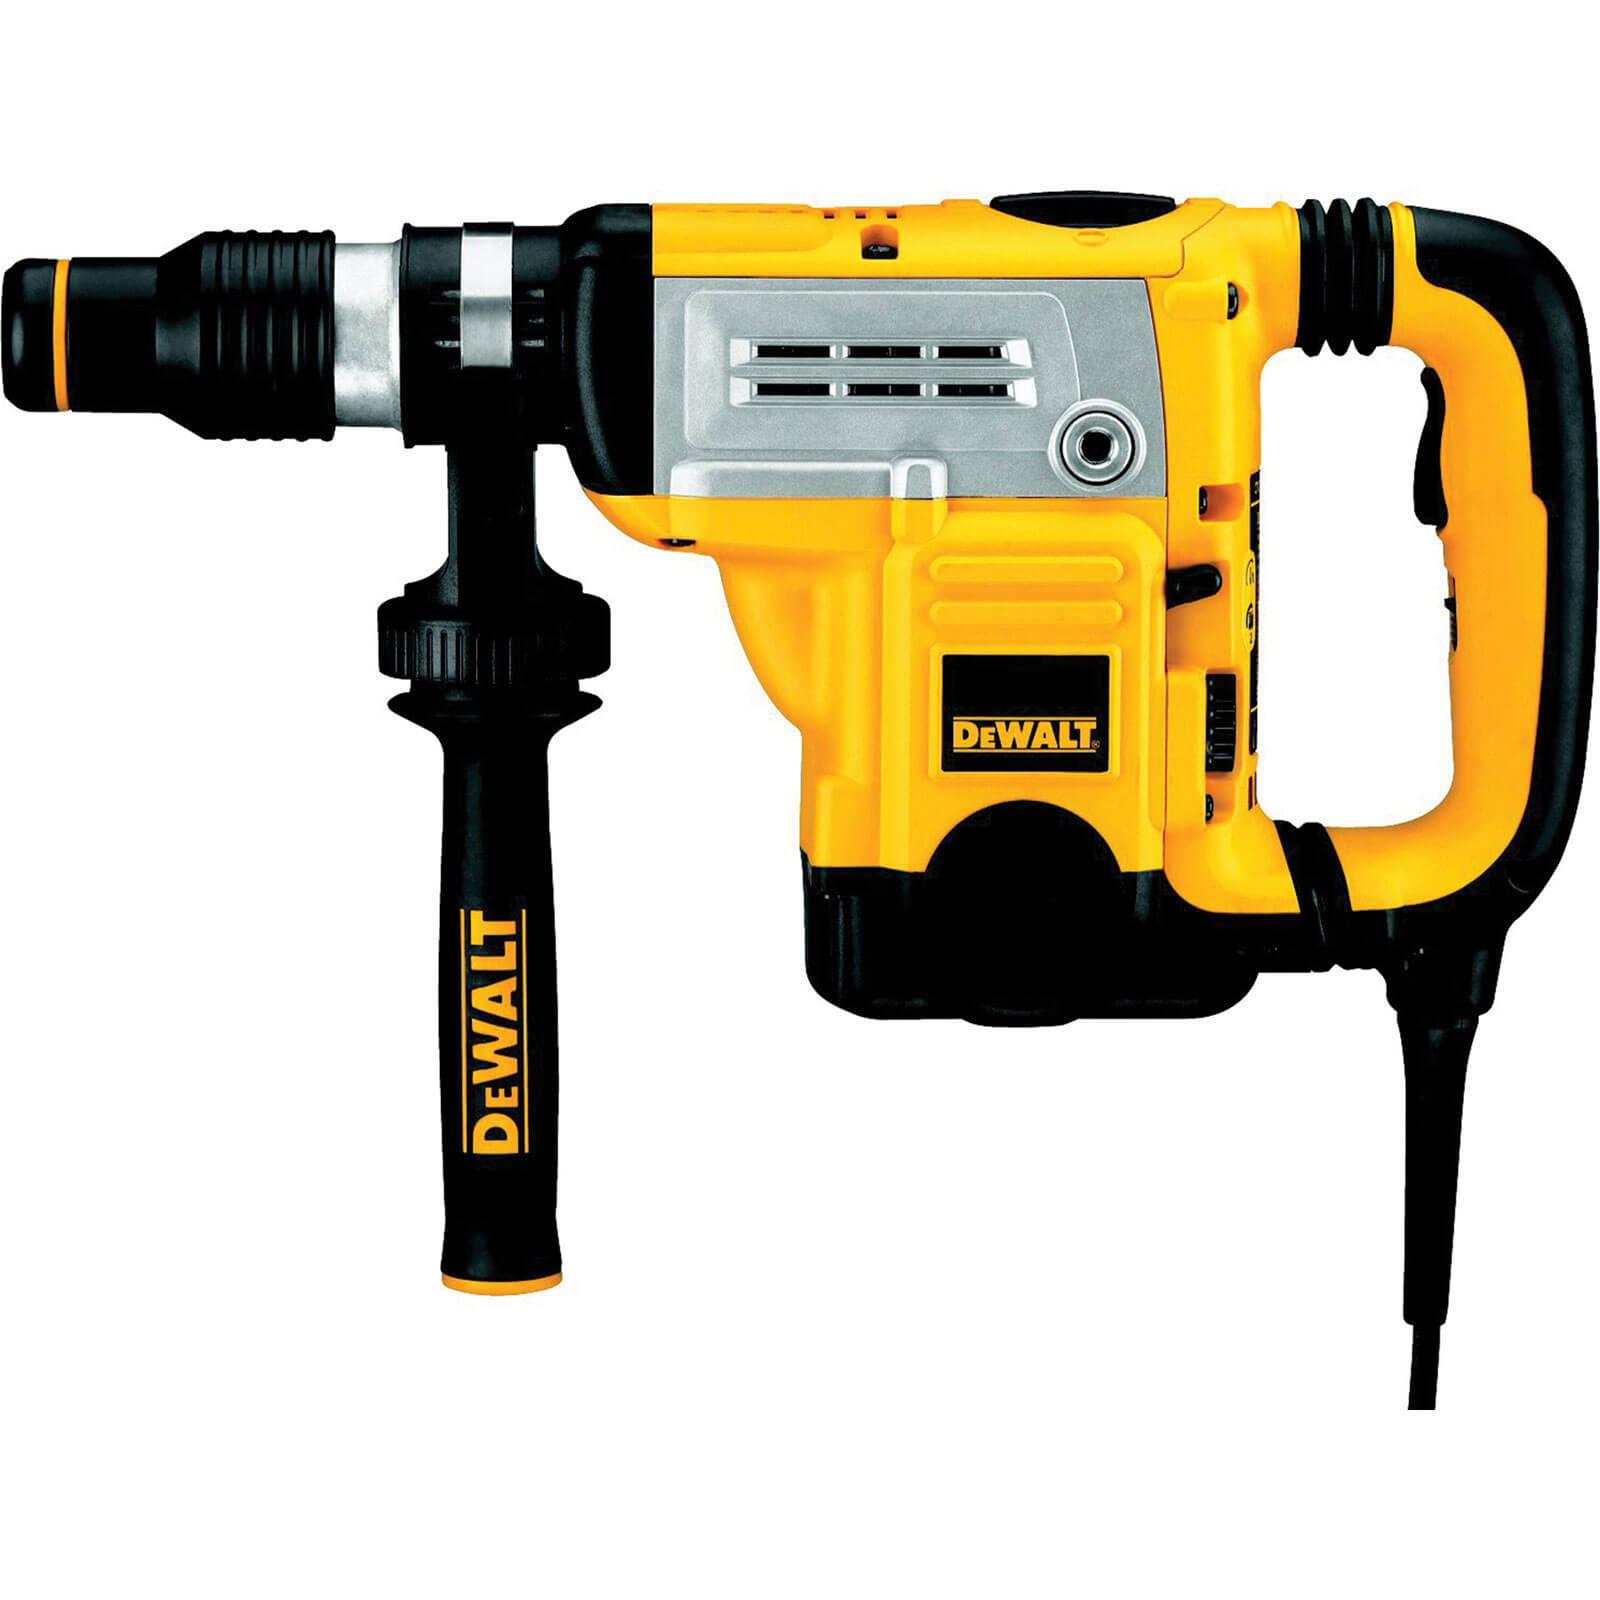 DeWalt D25601K 6 Kilo SDS Max Combi Drill 1250w 110v